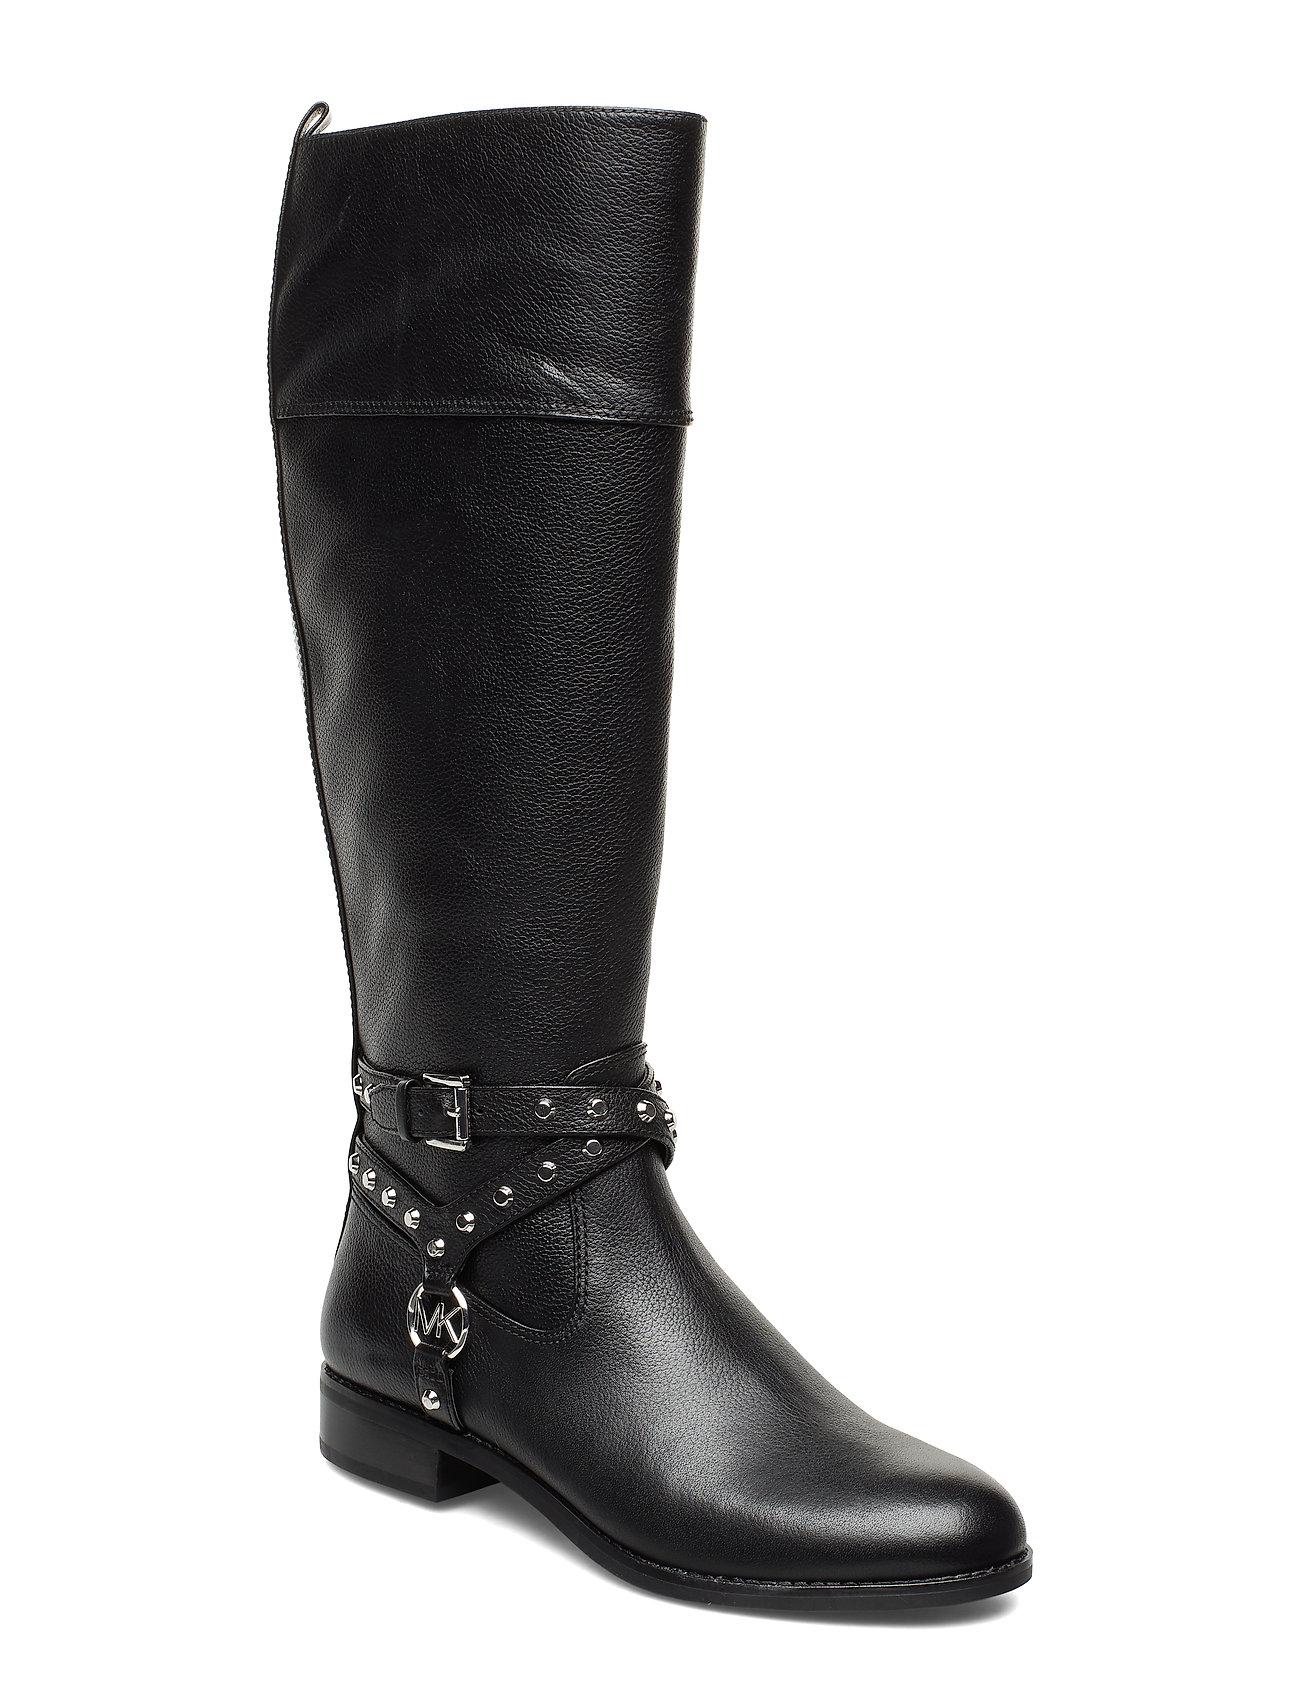 Michael Kors Shoes PRESTON BOOT - BLACK